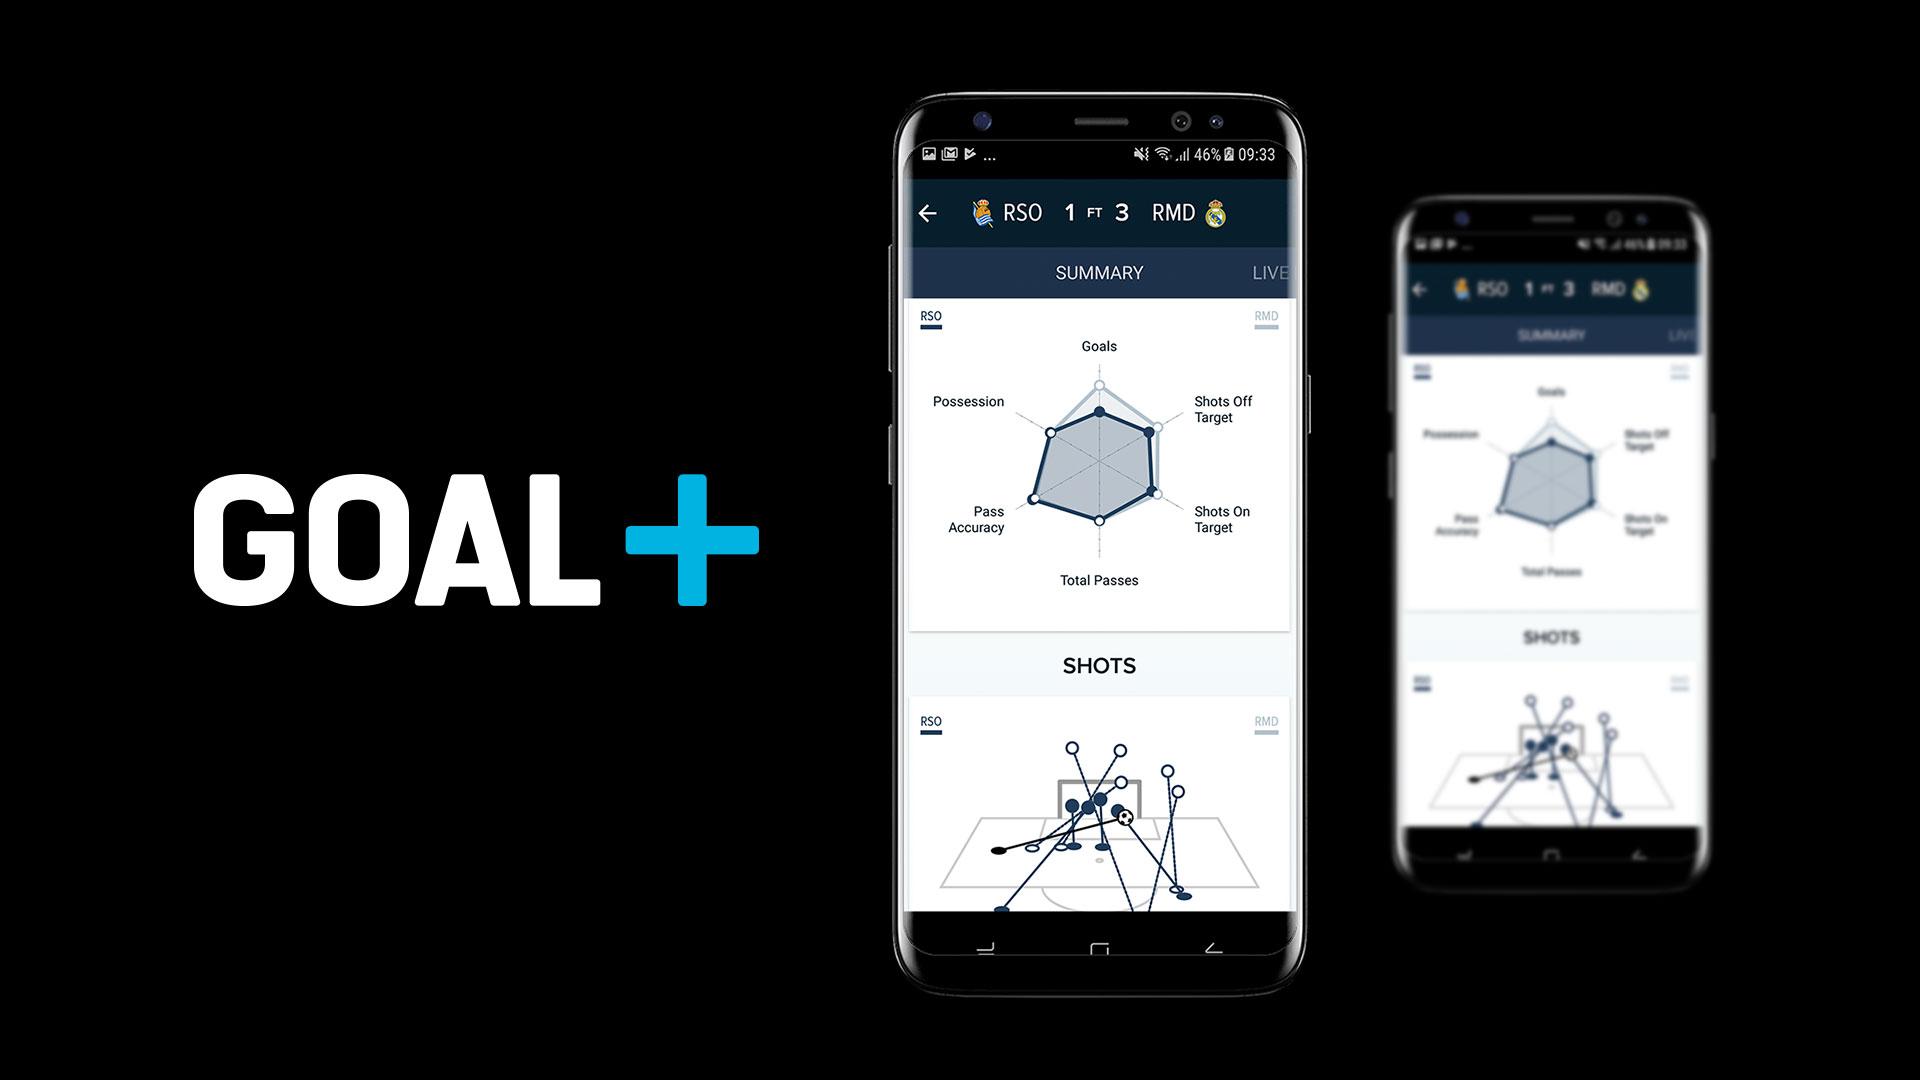 GFX Samsung Resl Sociedad Real Madrid 2017